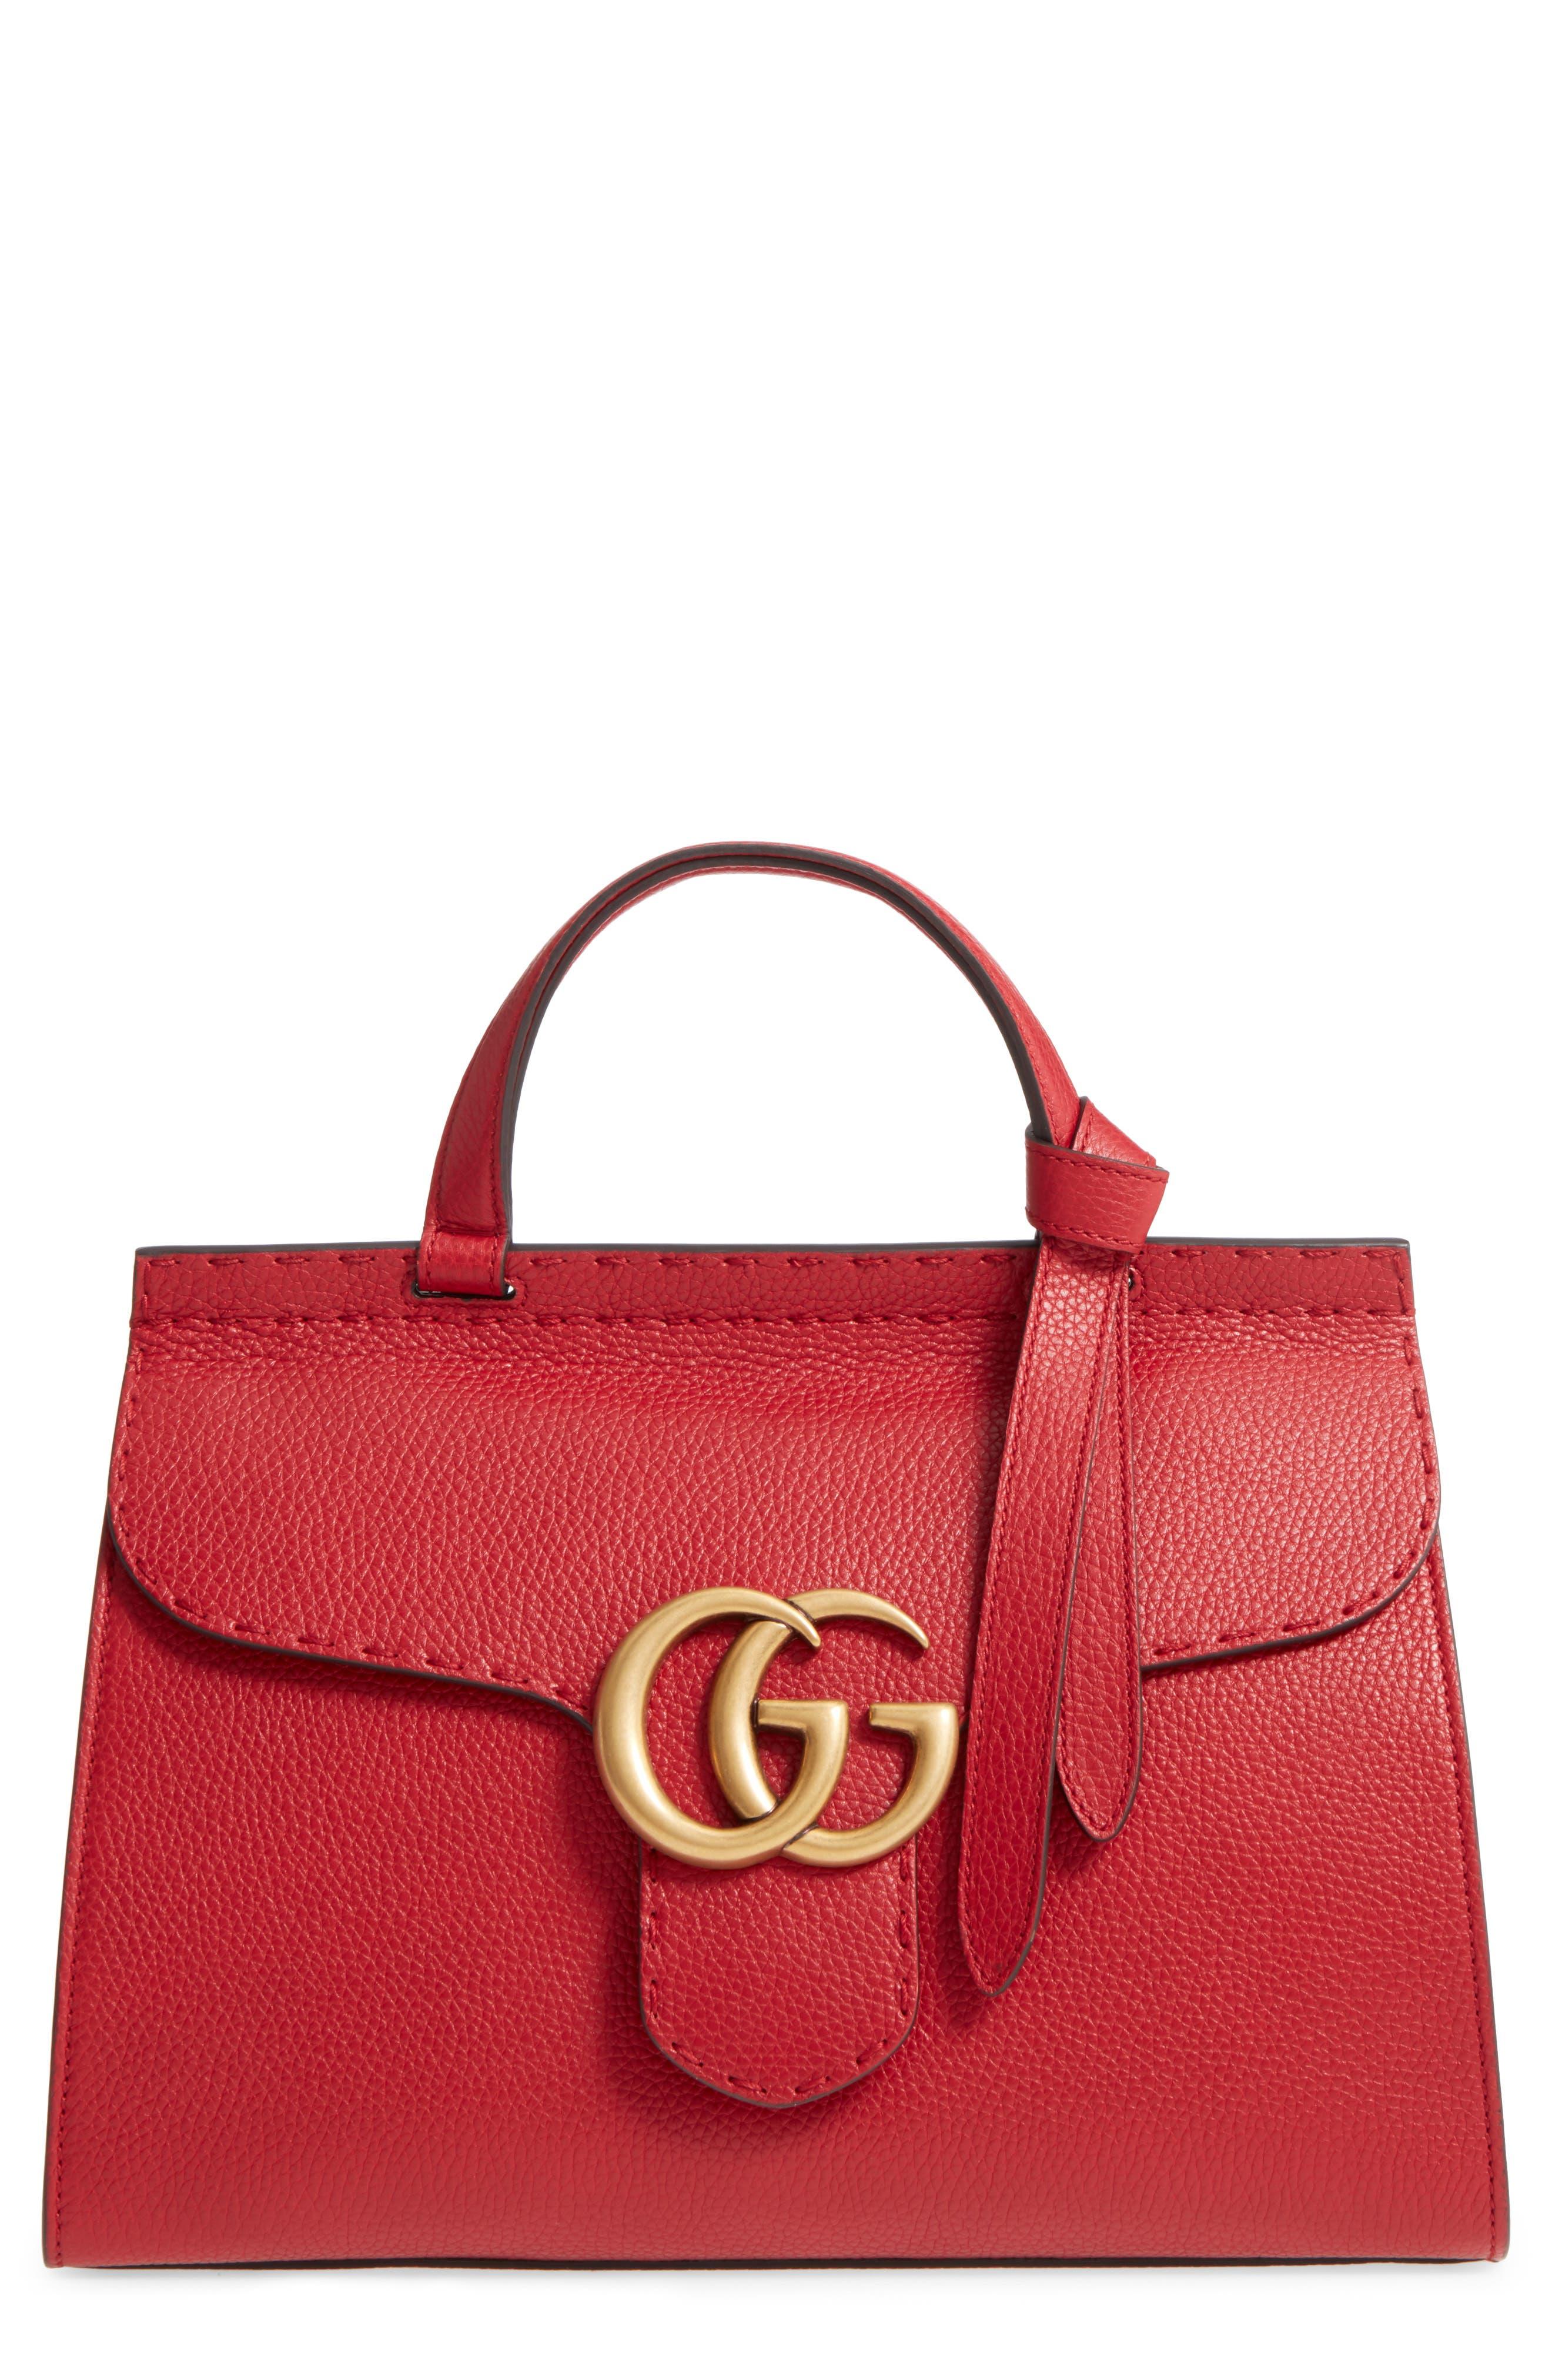 GG Marmont Top Handle Leather Satchel,                             Main thumbnail 1, color,                             621